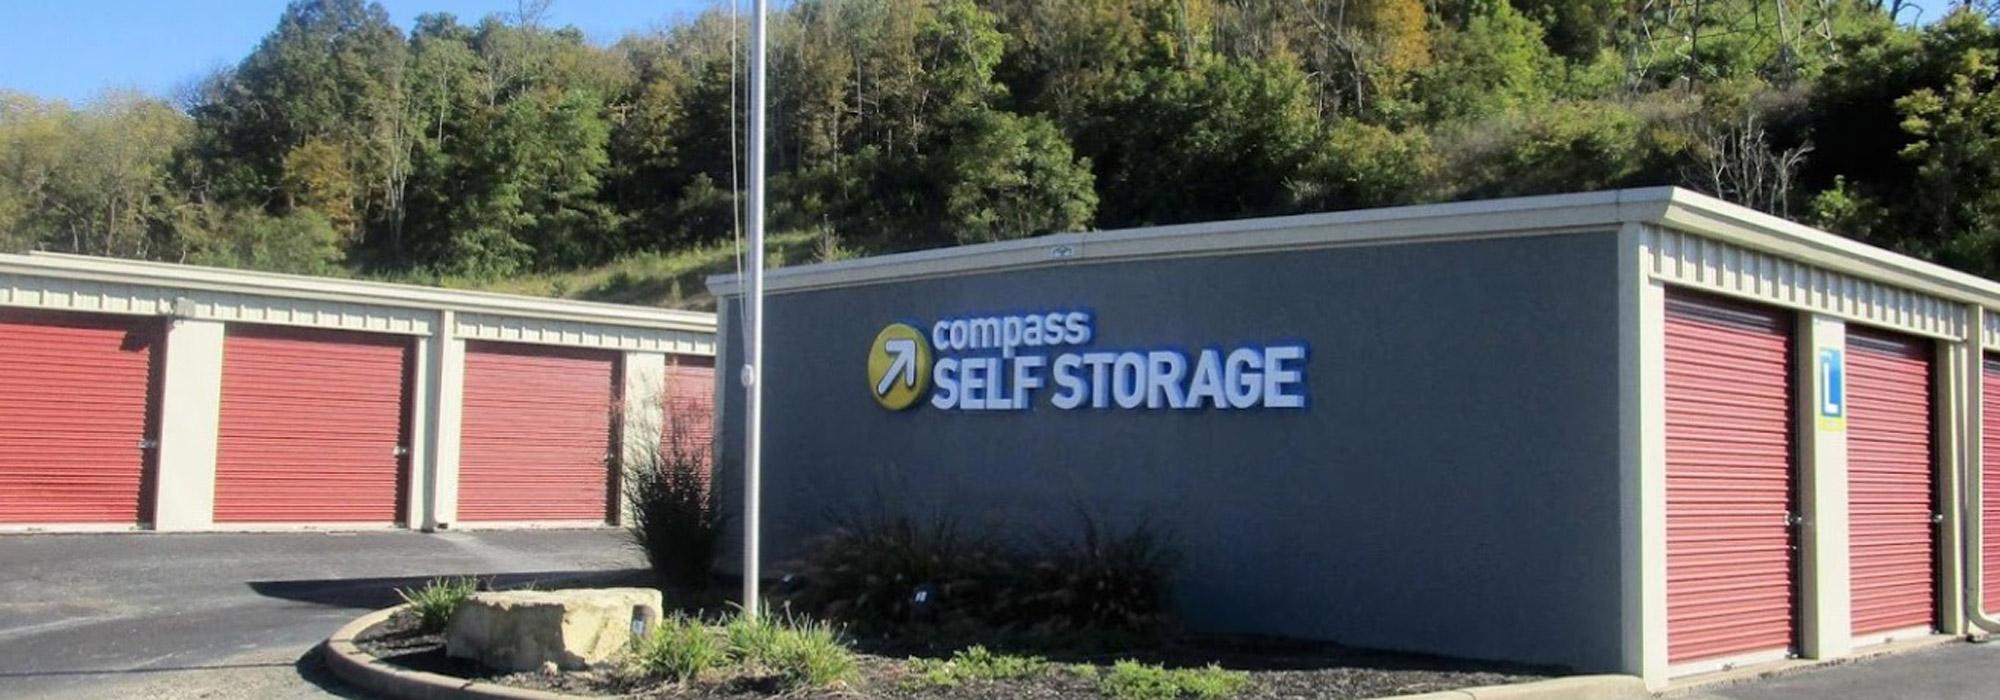 Self storage in Cold Spring KY